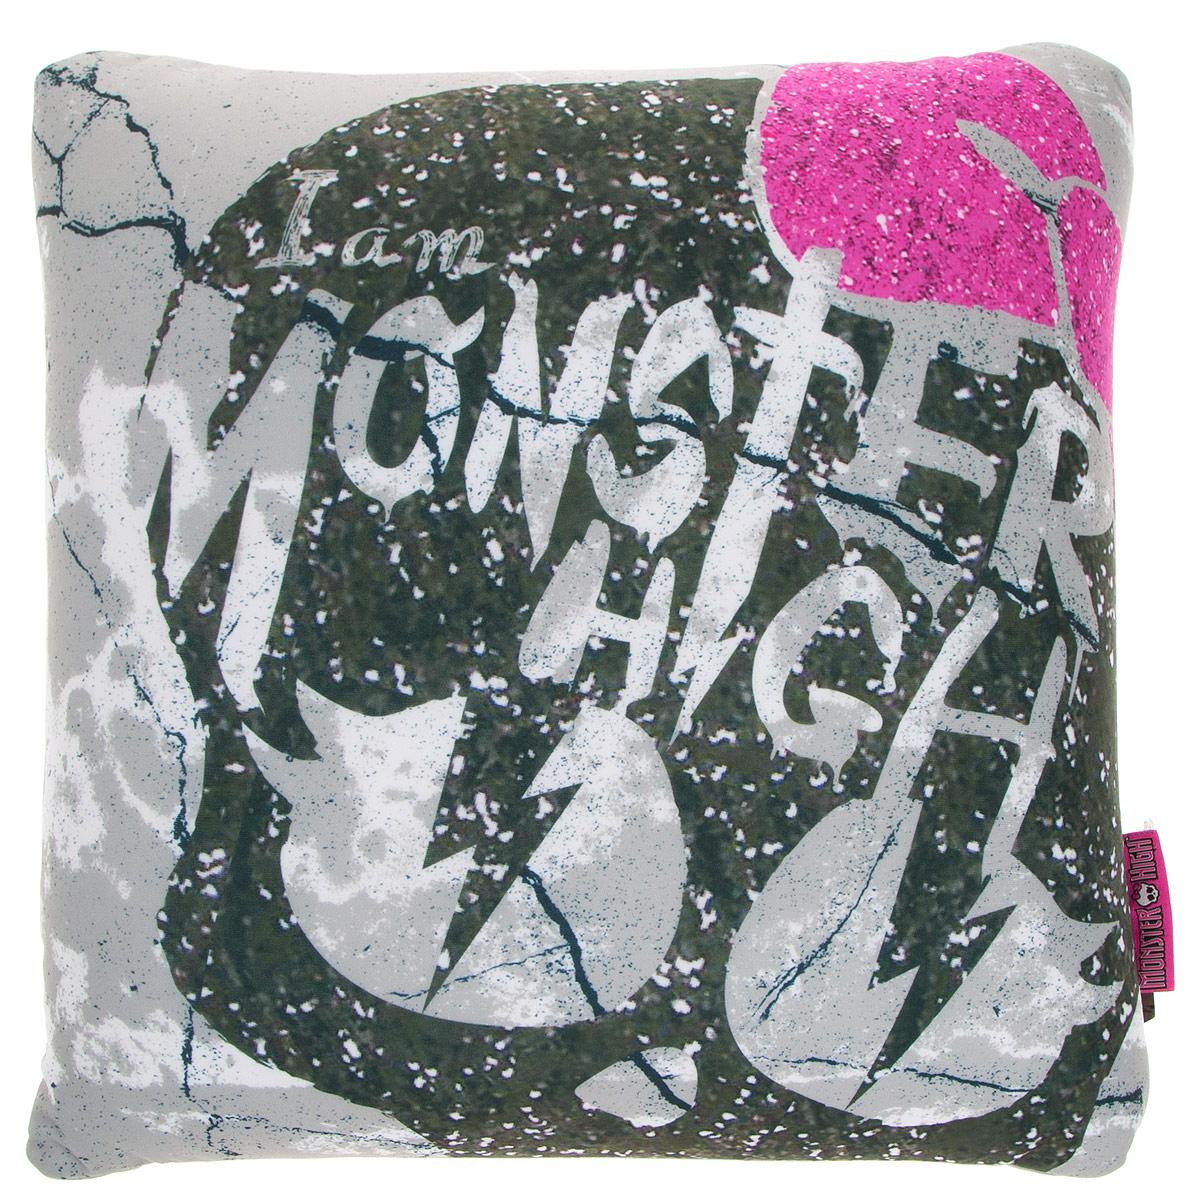 Maxi Toys Подушка Monster High цвет серый оливковый розовый